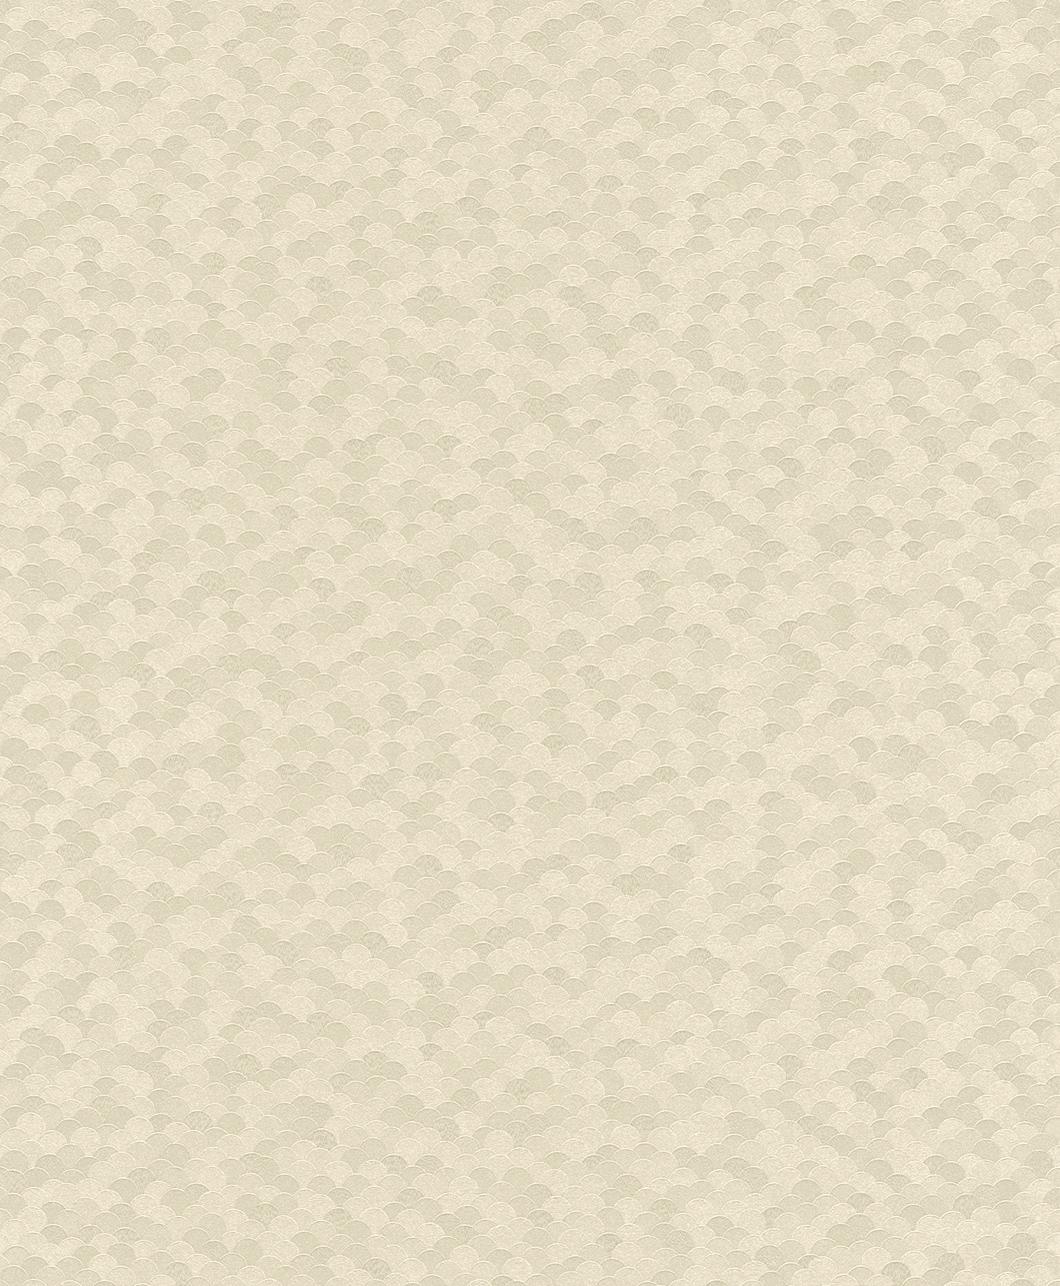 rasch tapeten barbara becker home passion 2014 kreise 453447 3 93 m ebay. Black Bedroom Furniture Sets. Home Design Ideas